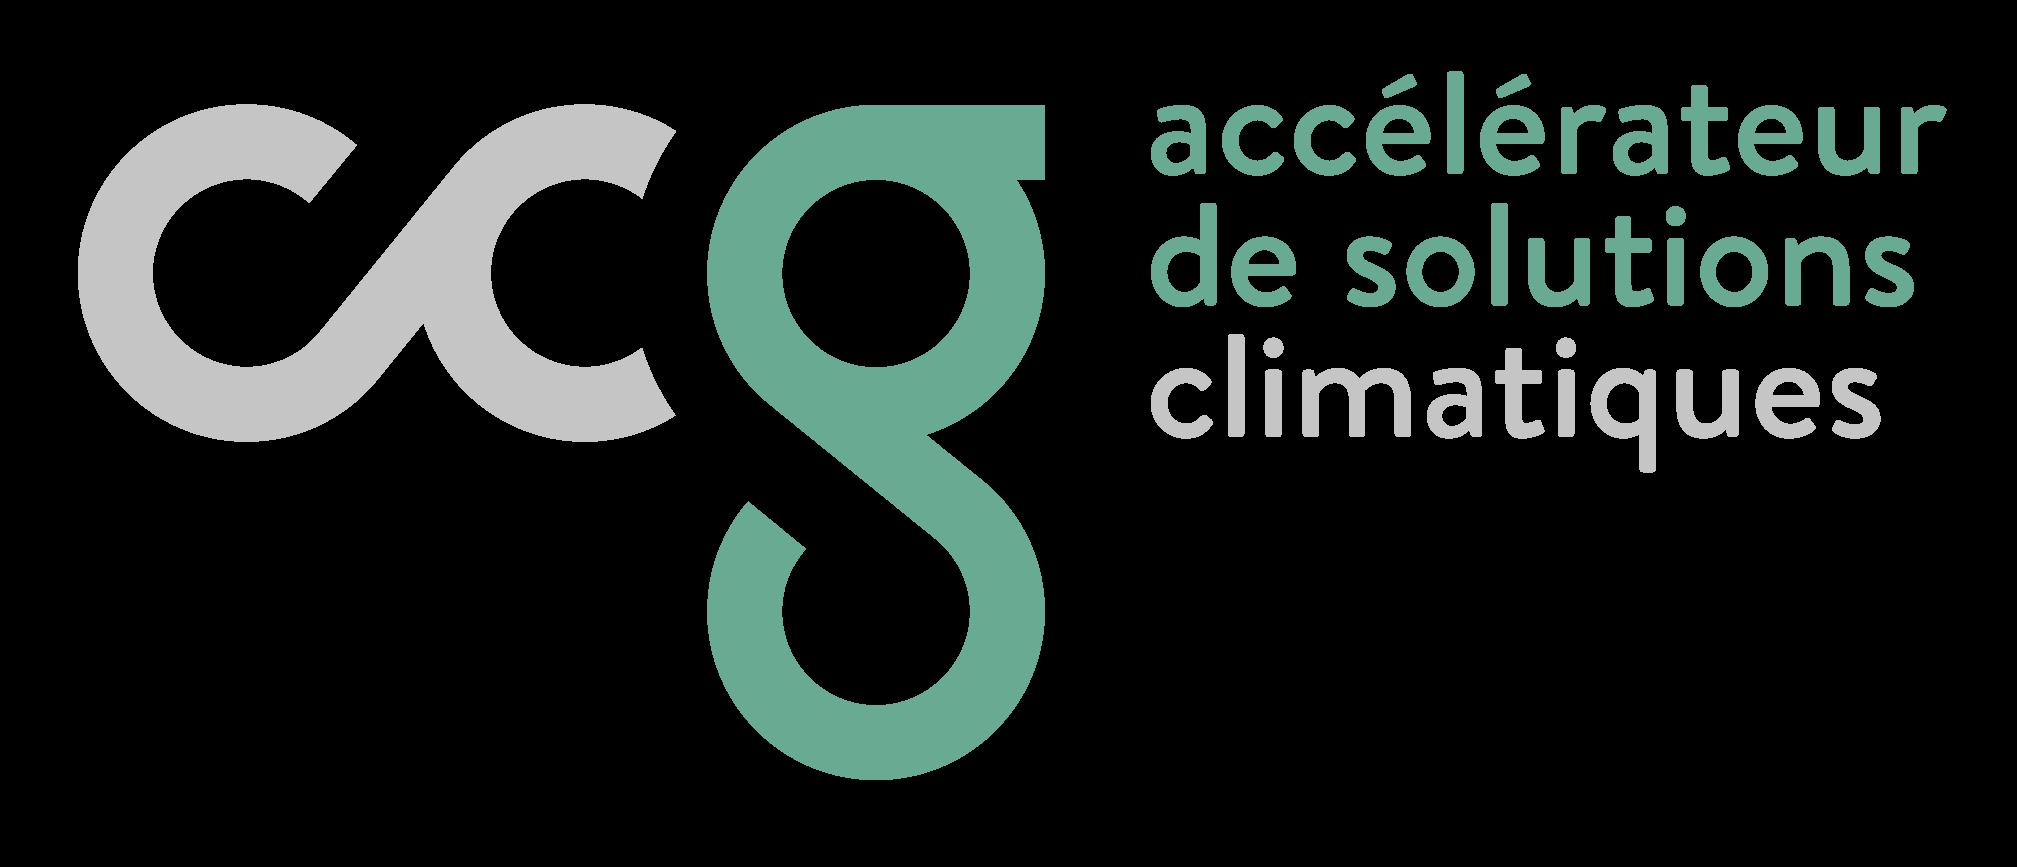 CCG Climat